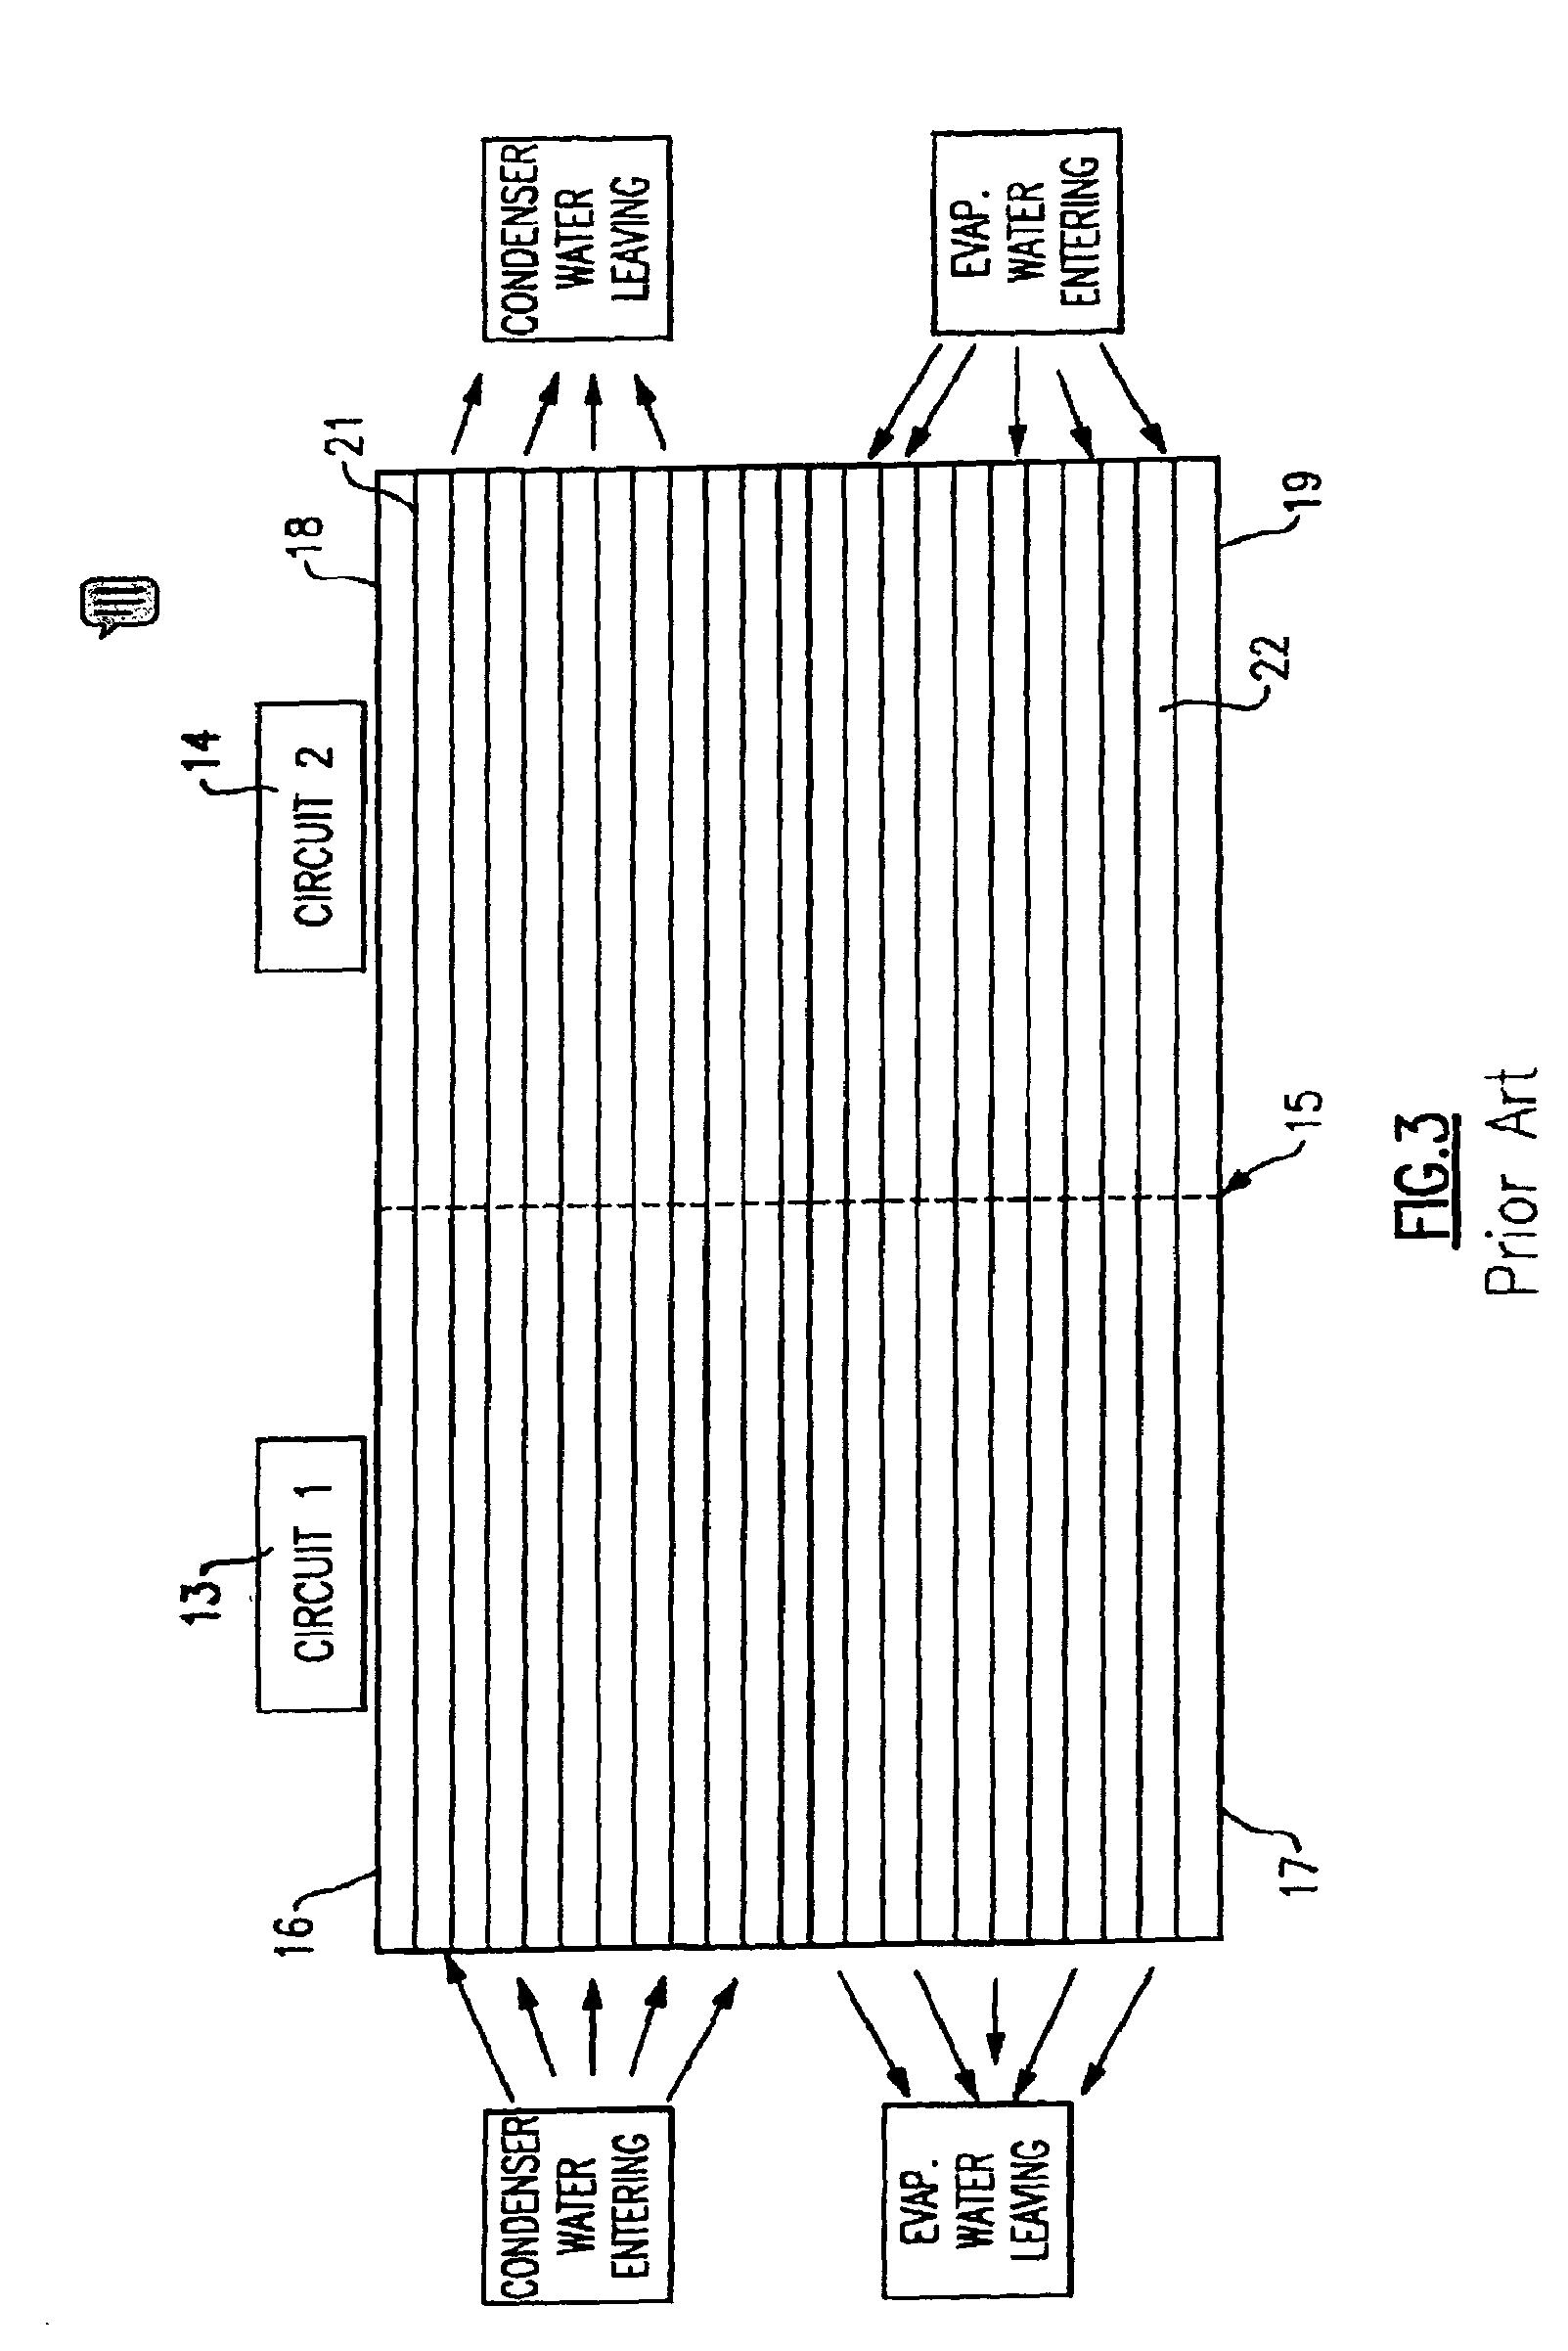 diagram drake wiring chiller estq60s2 refrigeration: dual circuit refrigeration